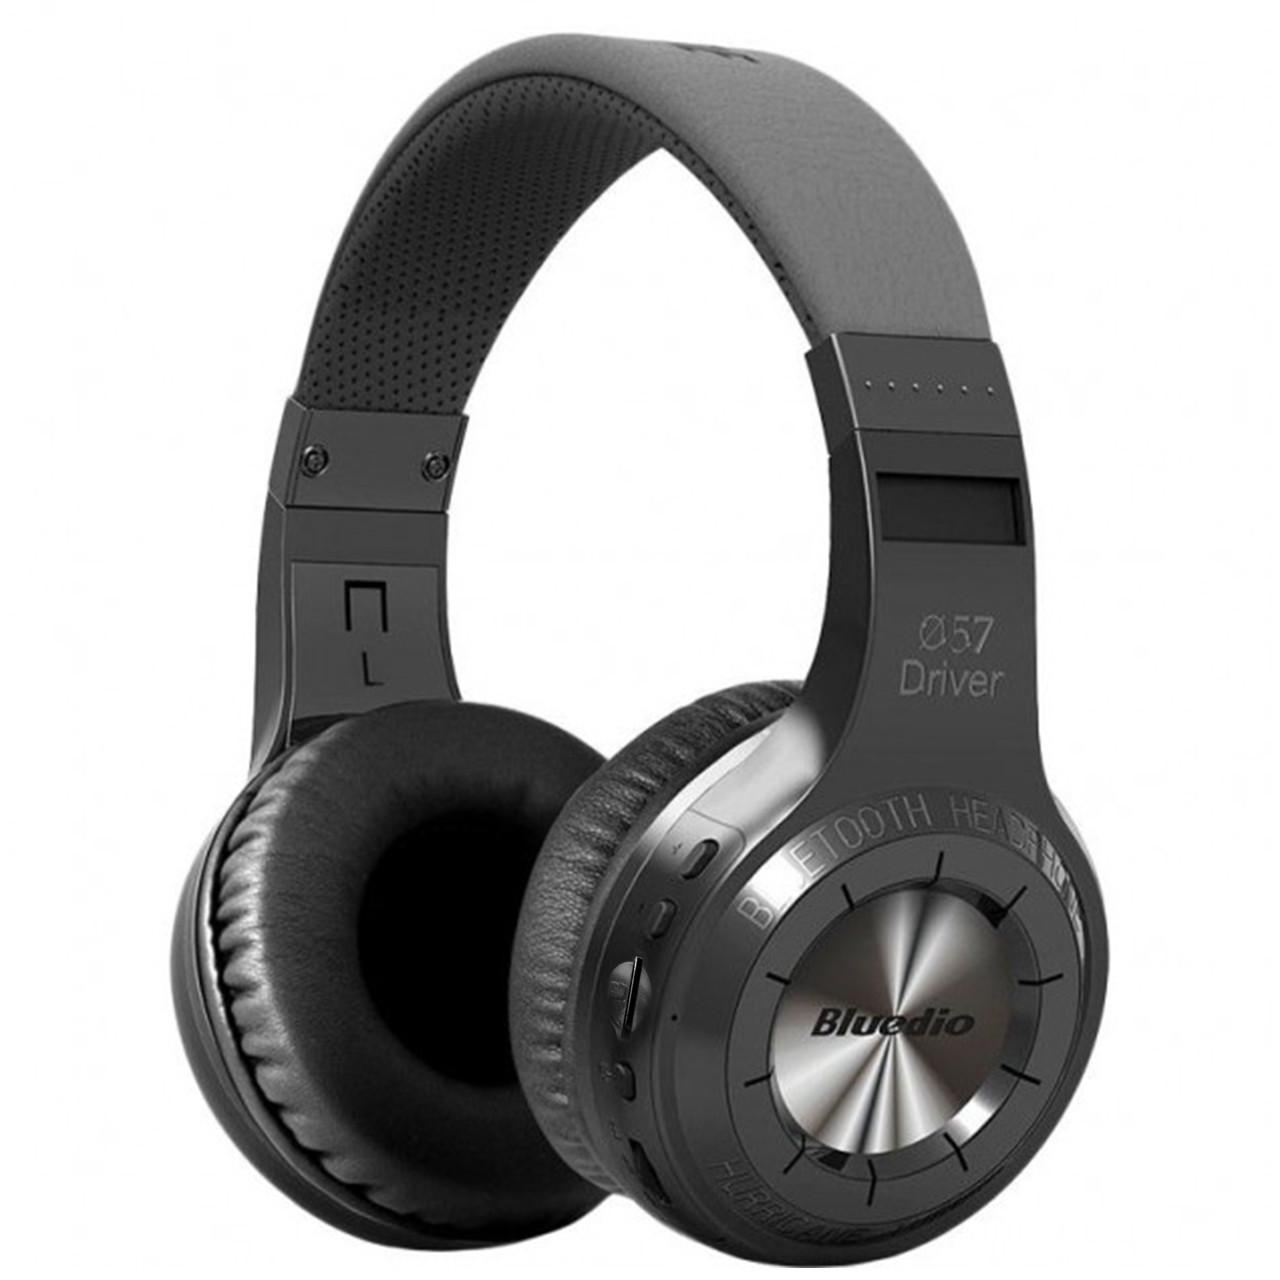 Стерео bluetooth гарнитура Bluedio H+ Black (1151-2552)